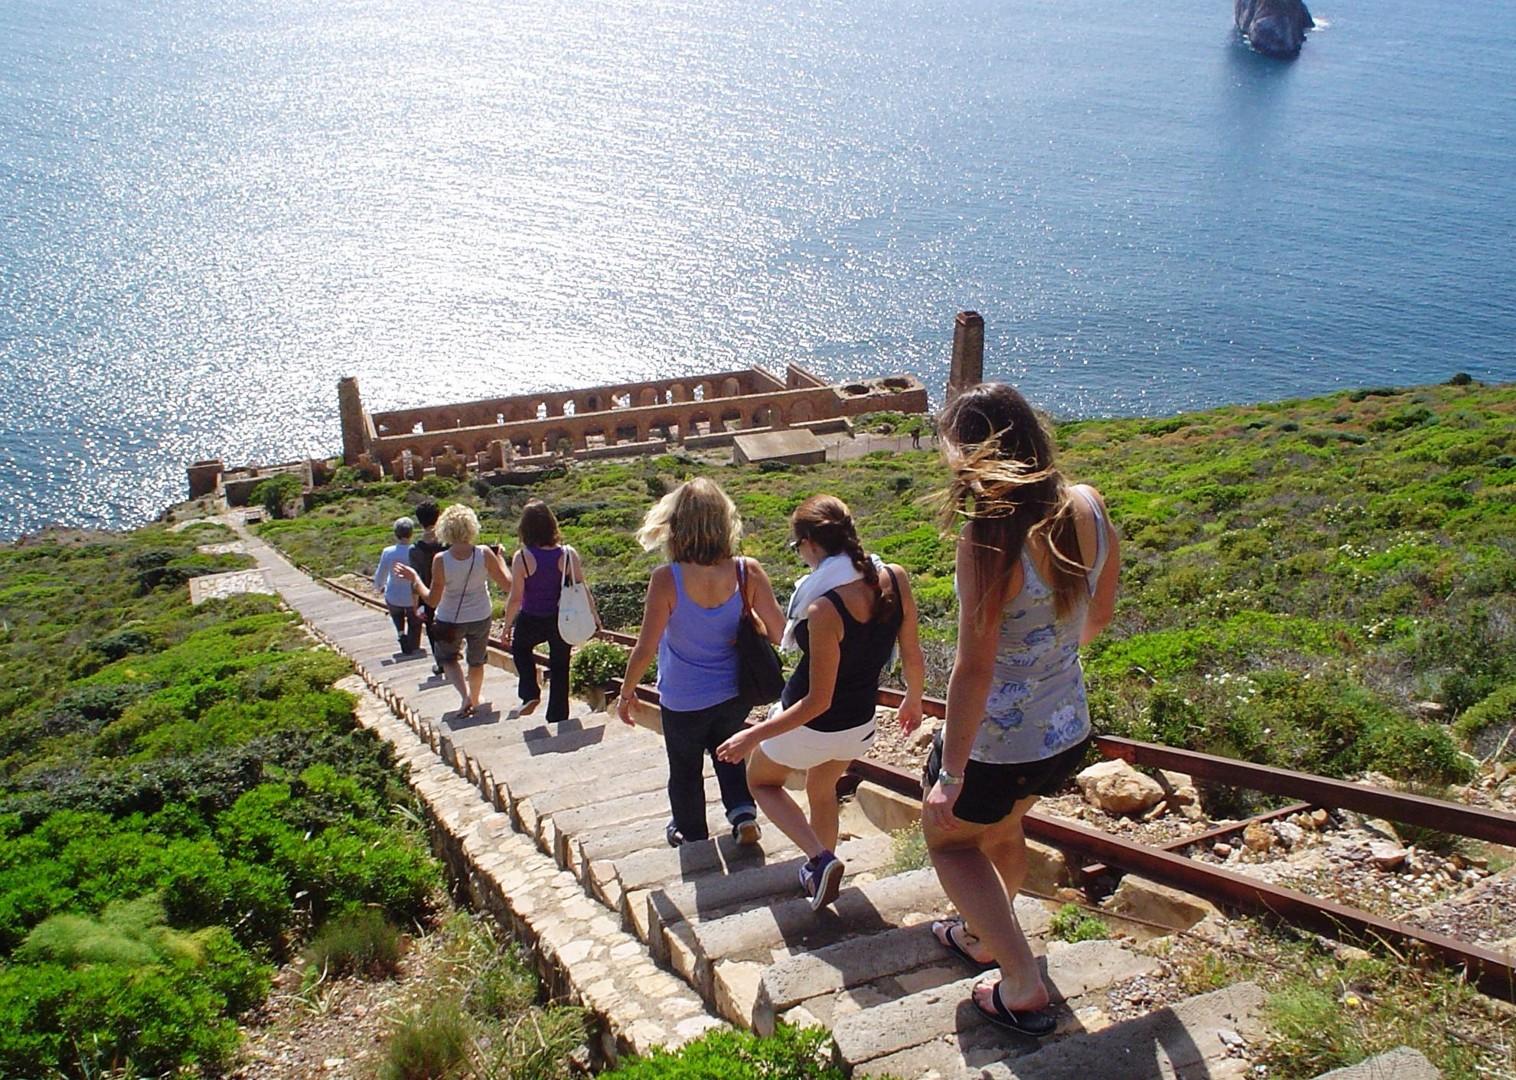 coastal-paths-island-flavours.jpg - Italy - Sardinia - Island Flavours - Leisure Cycling